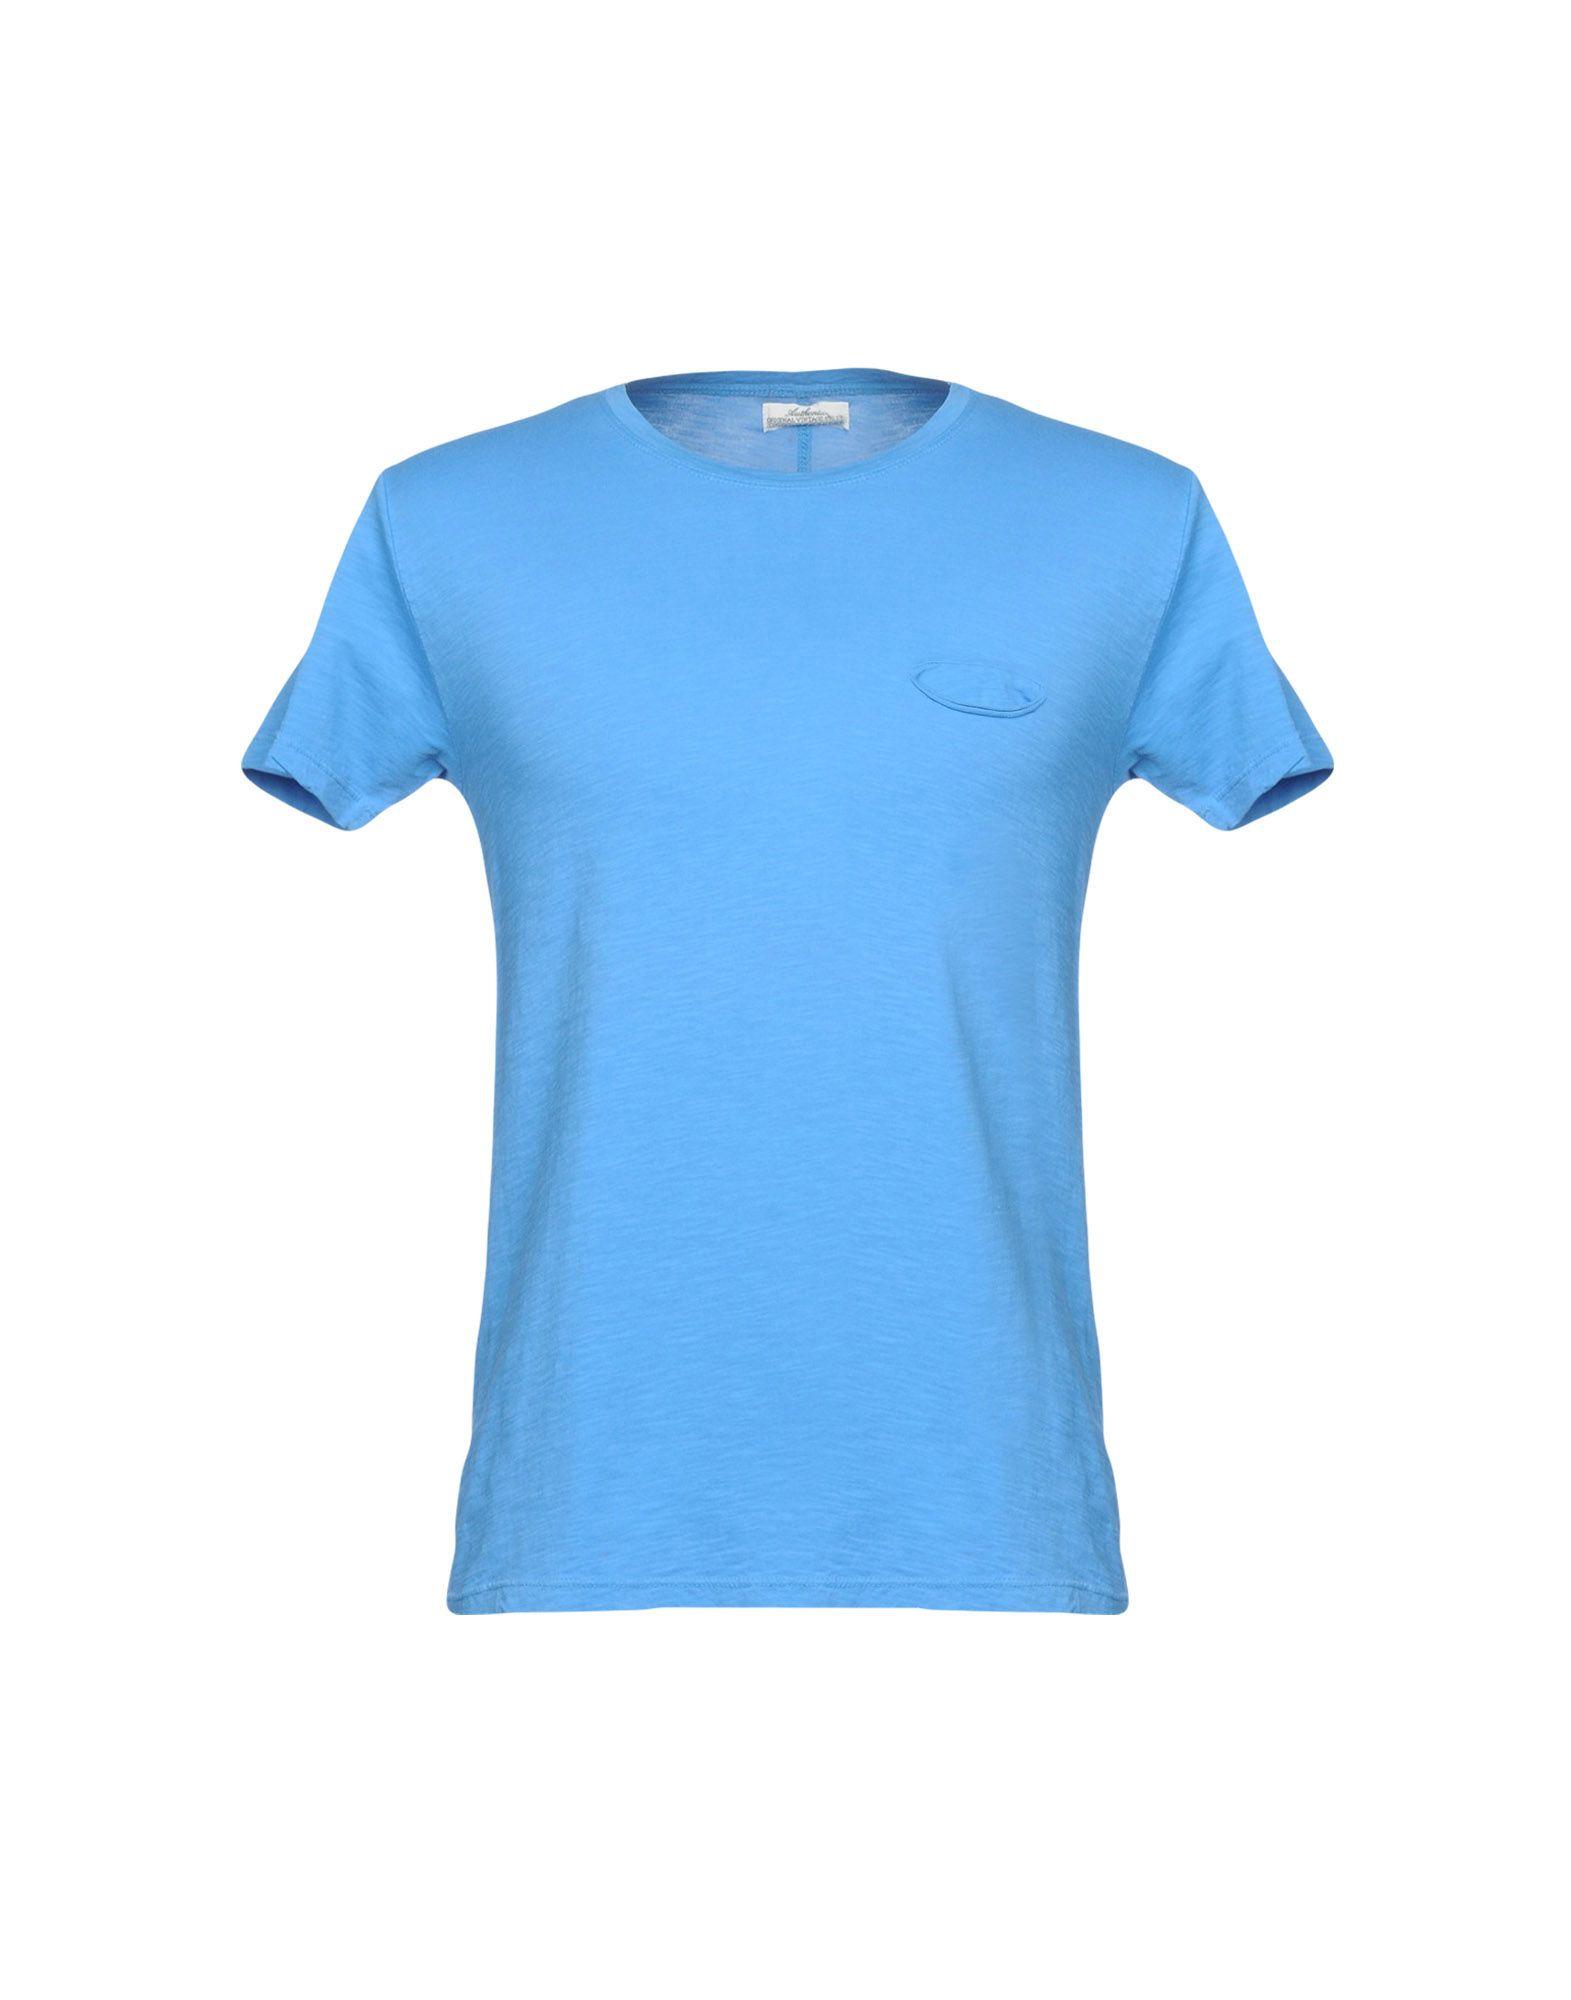 T-Shirt T-Shirt T-Shirt autentico Original Vintage Style Uomo - 12114648VQ 5e483b